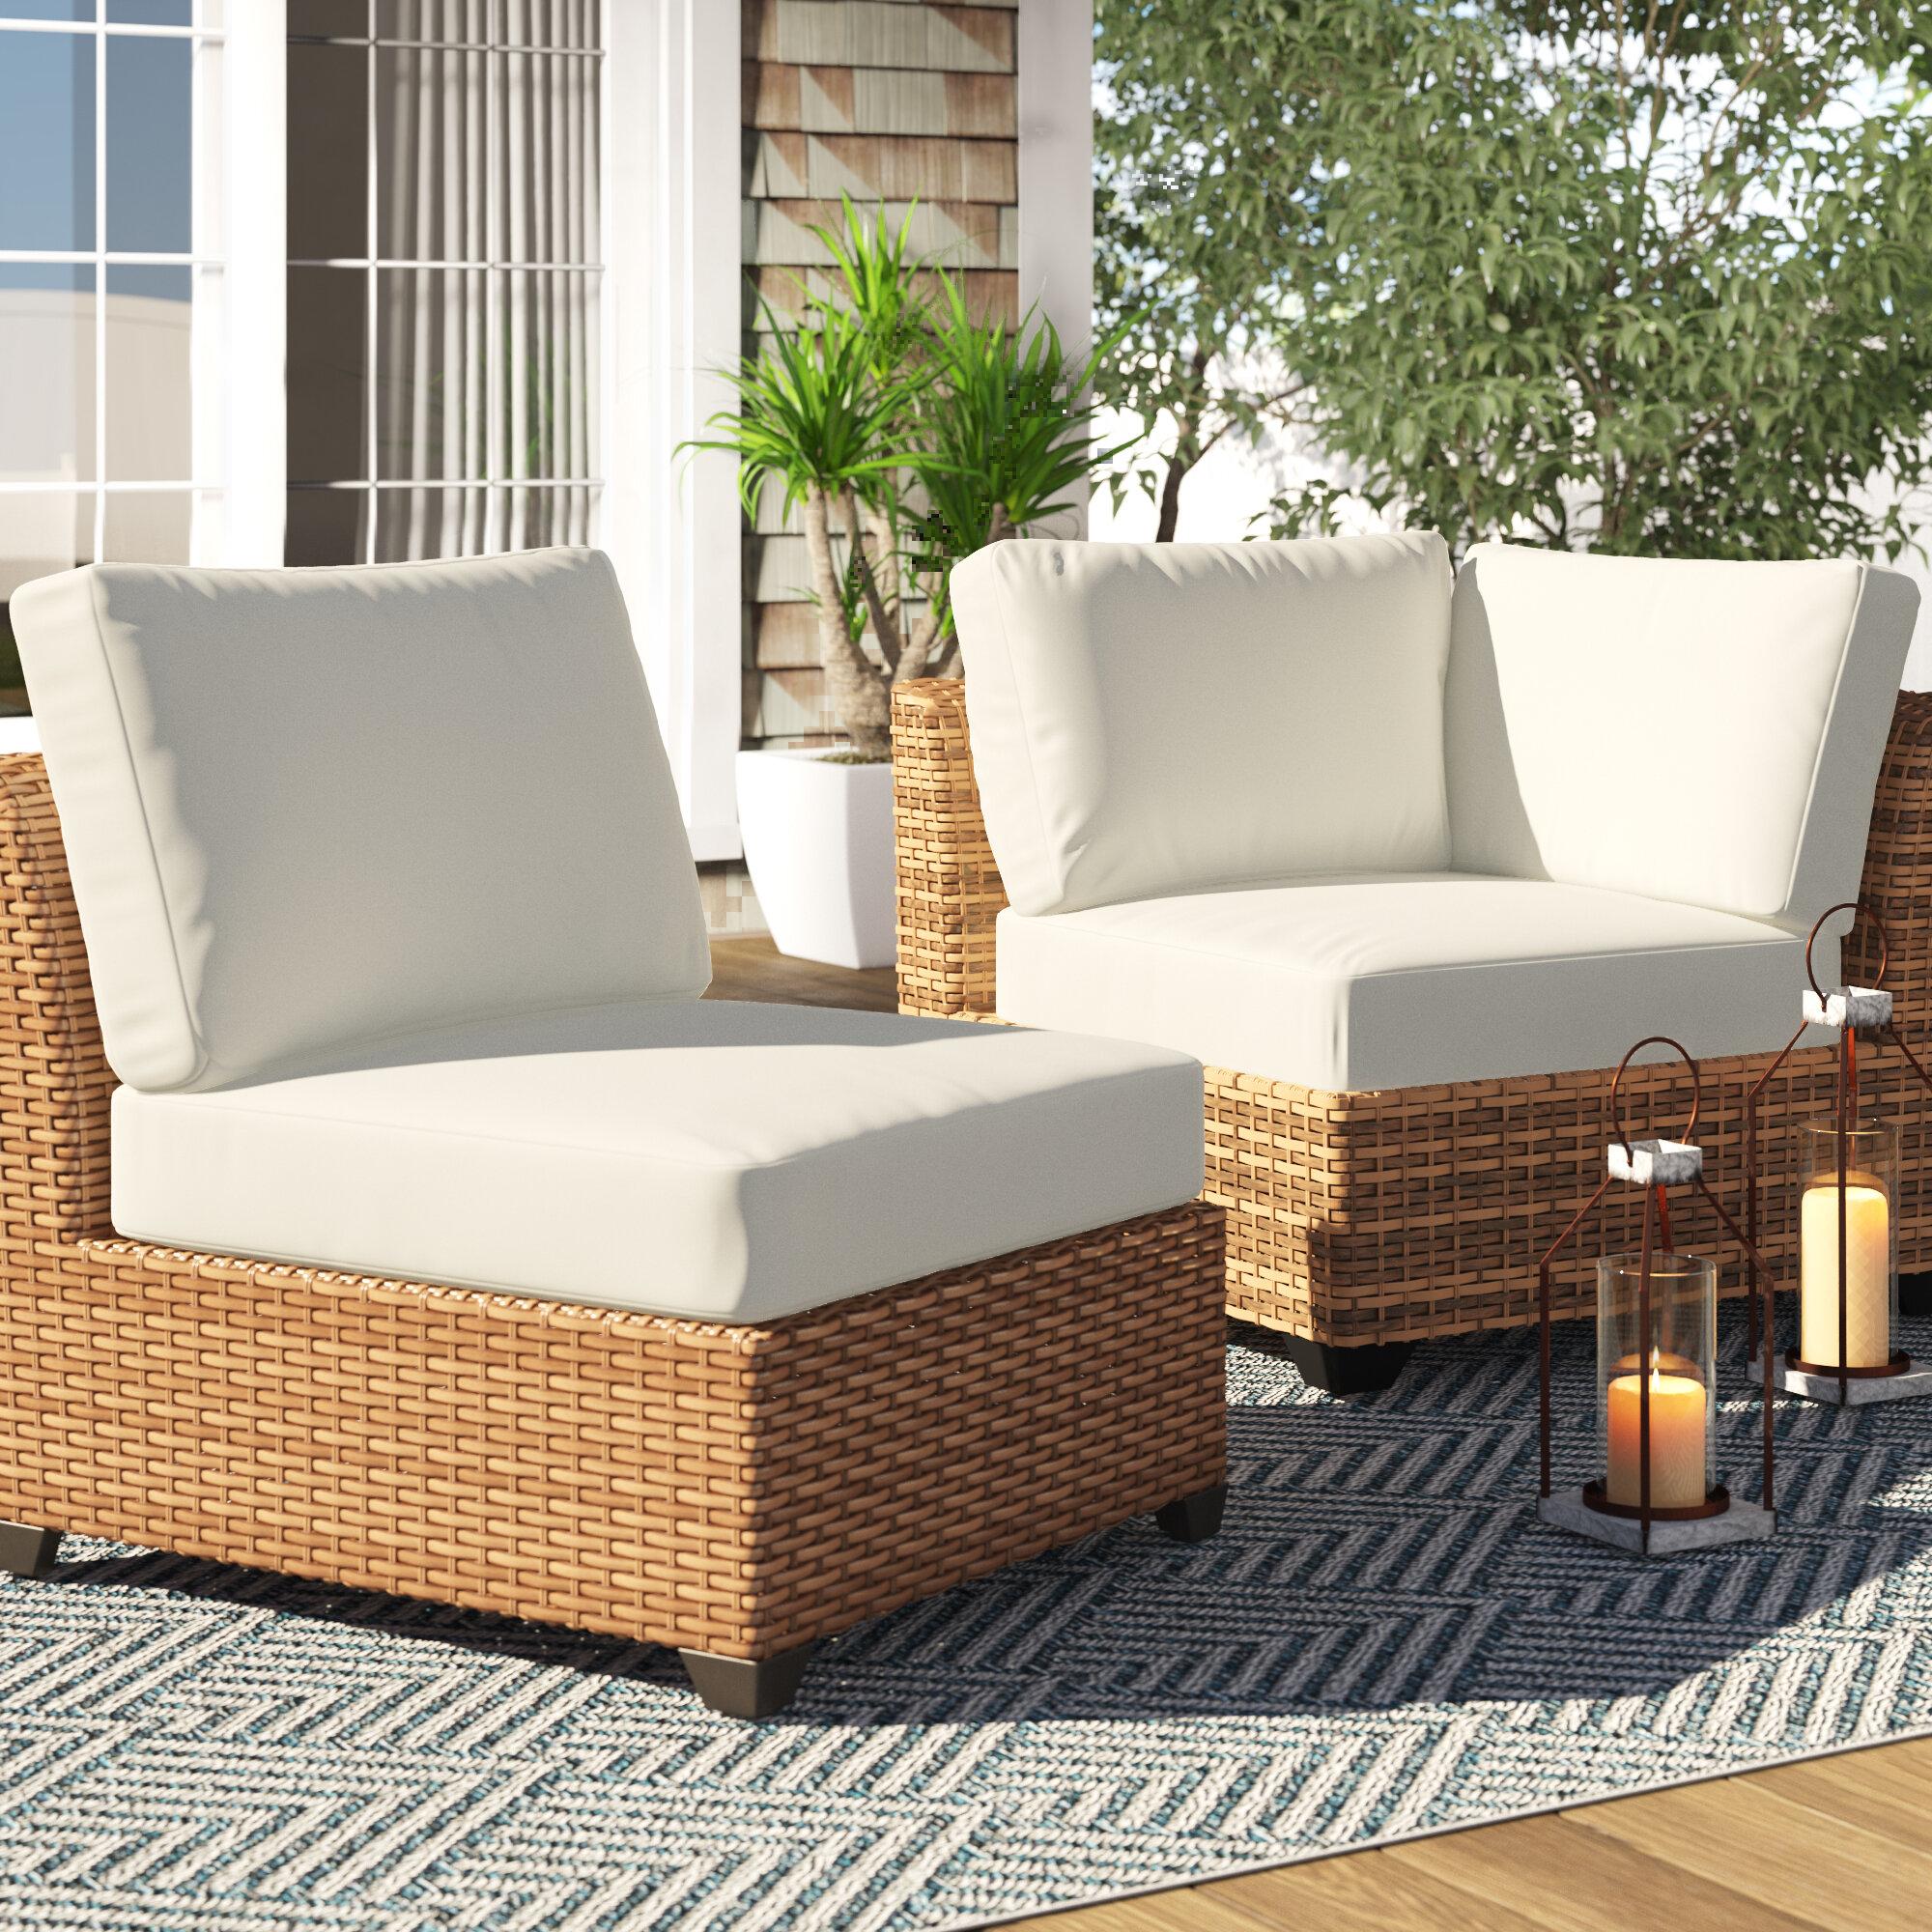 Merlyn Indoor Outdoor Cushion Cover